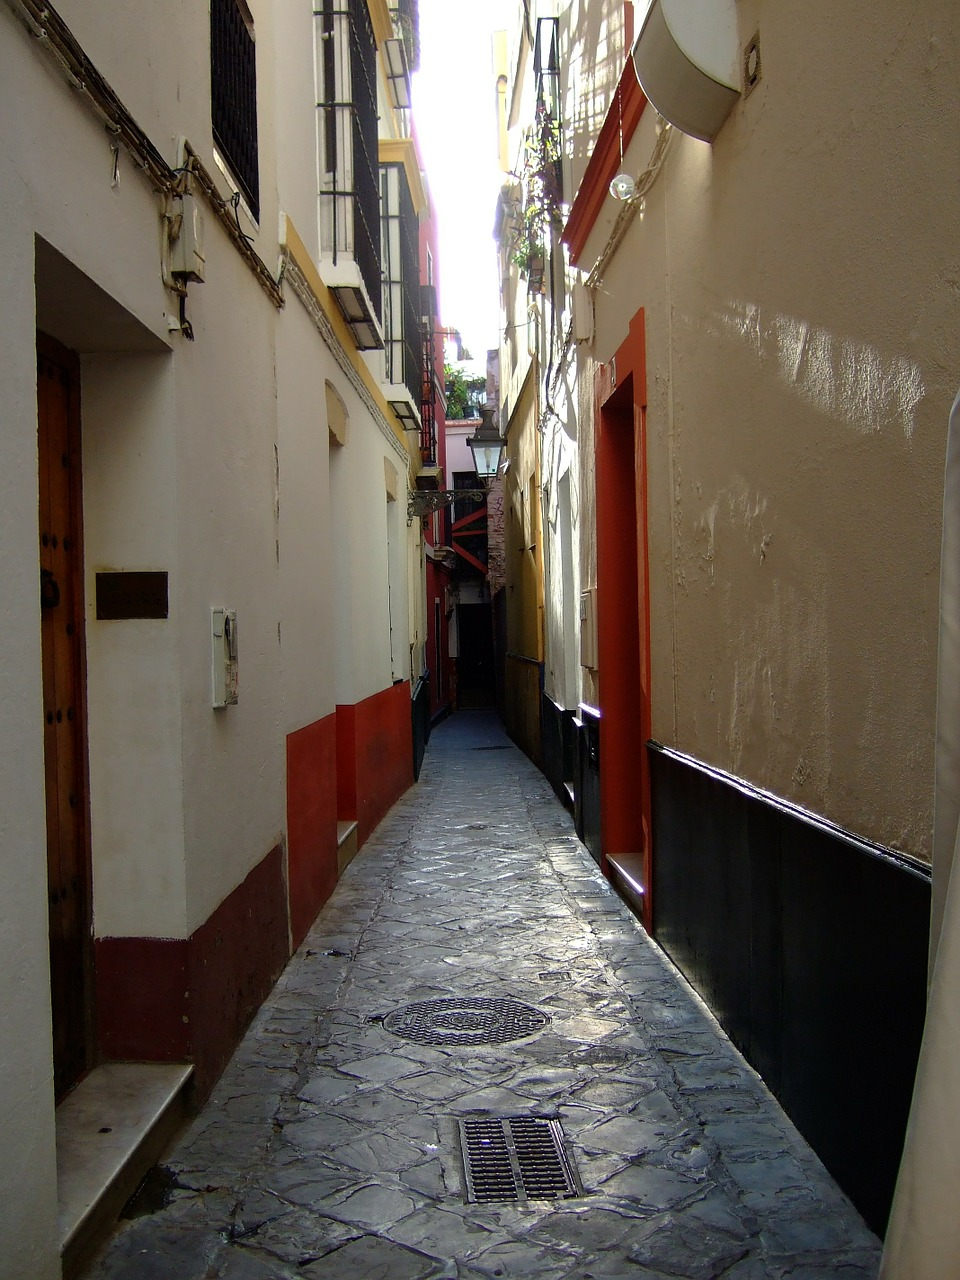 Lane,santa cruz,seville,andalusia,spain - free image from needpix.com